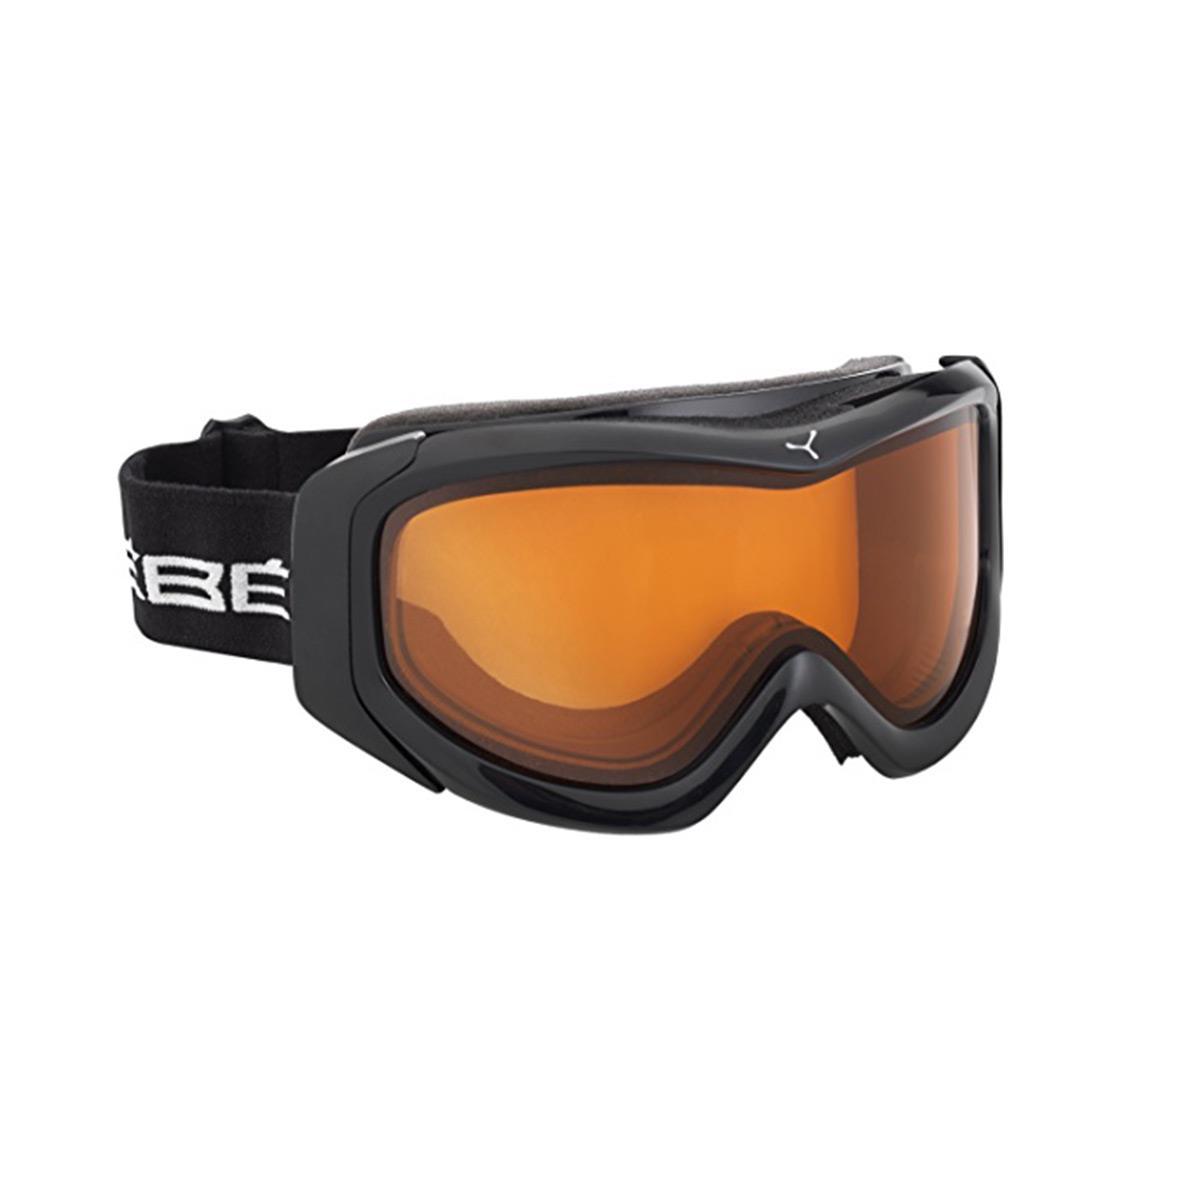 Cebe Eco Kayak Snowboard Gözlük L Siyah Kavuniçi CB1510D772L